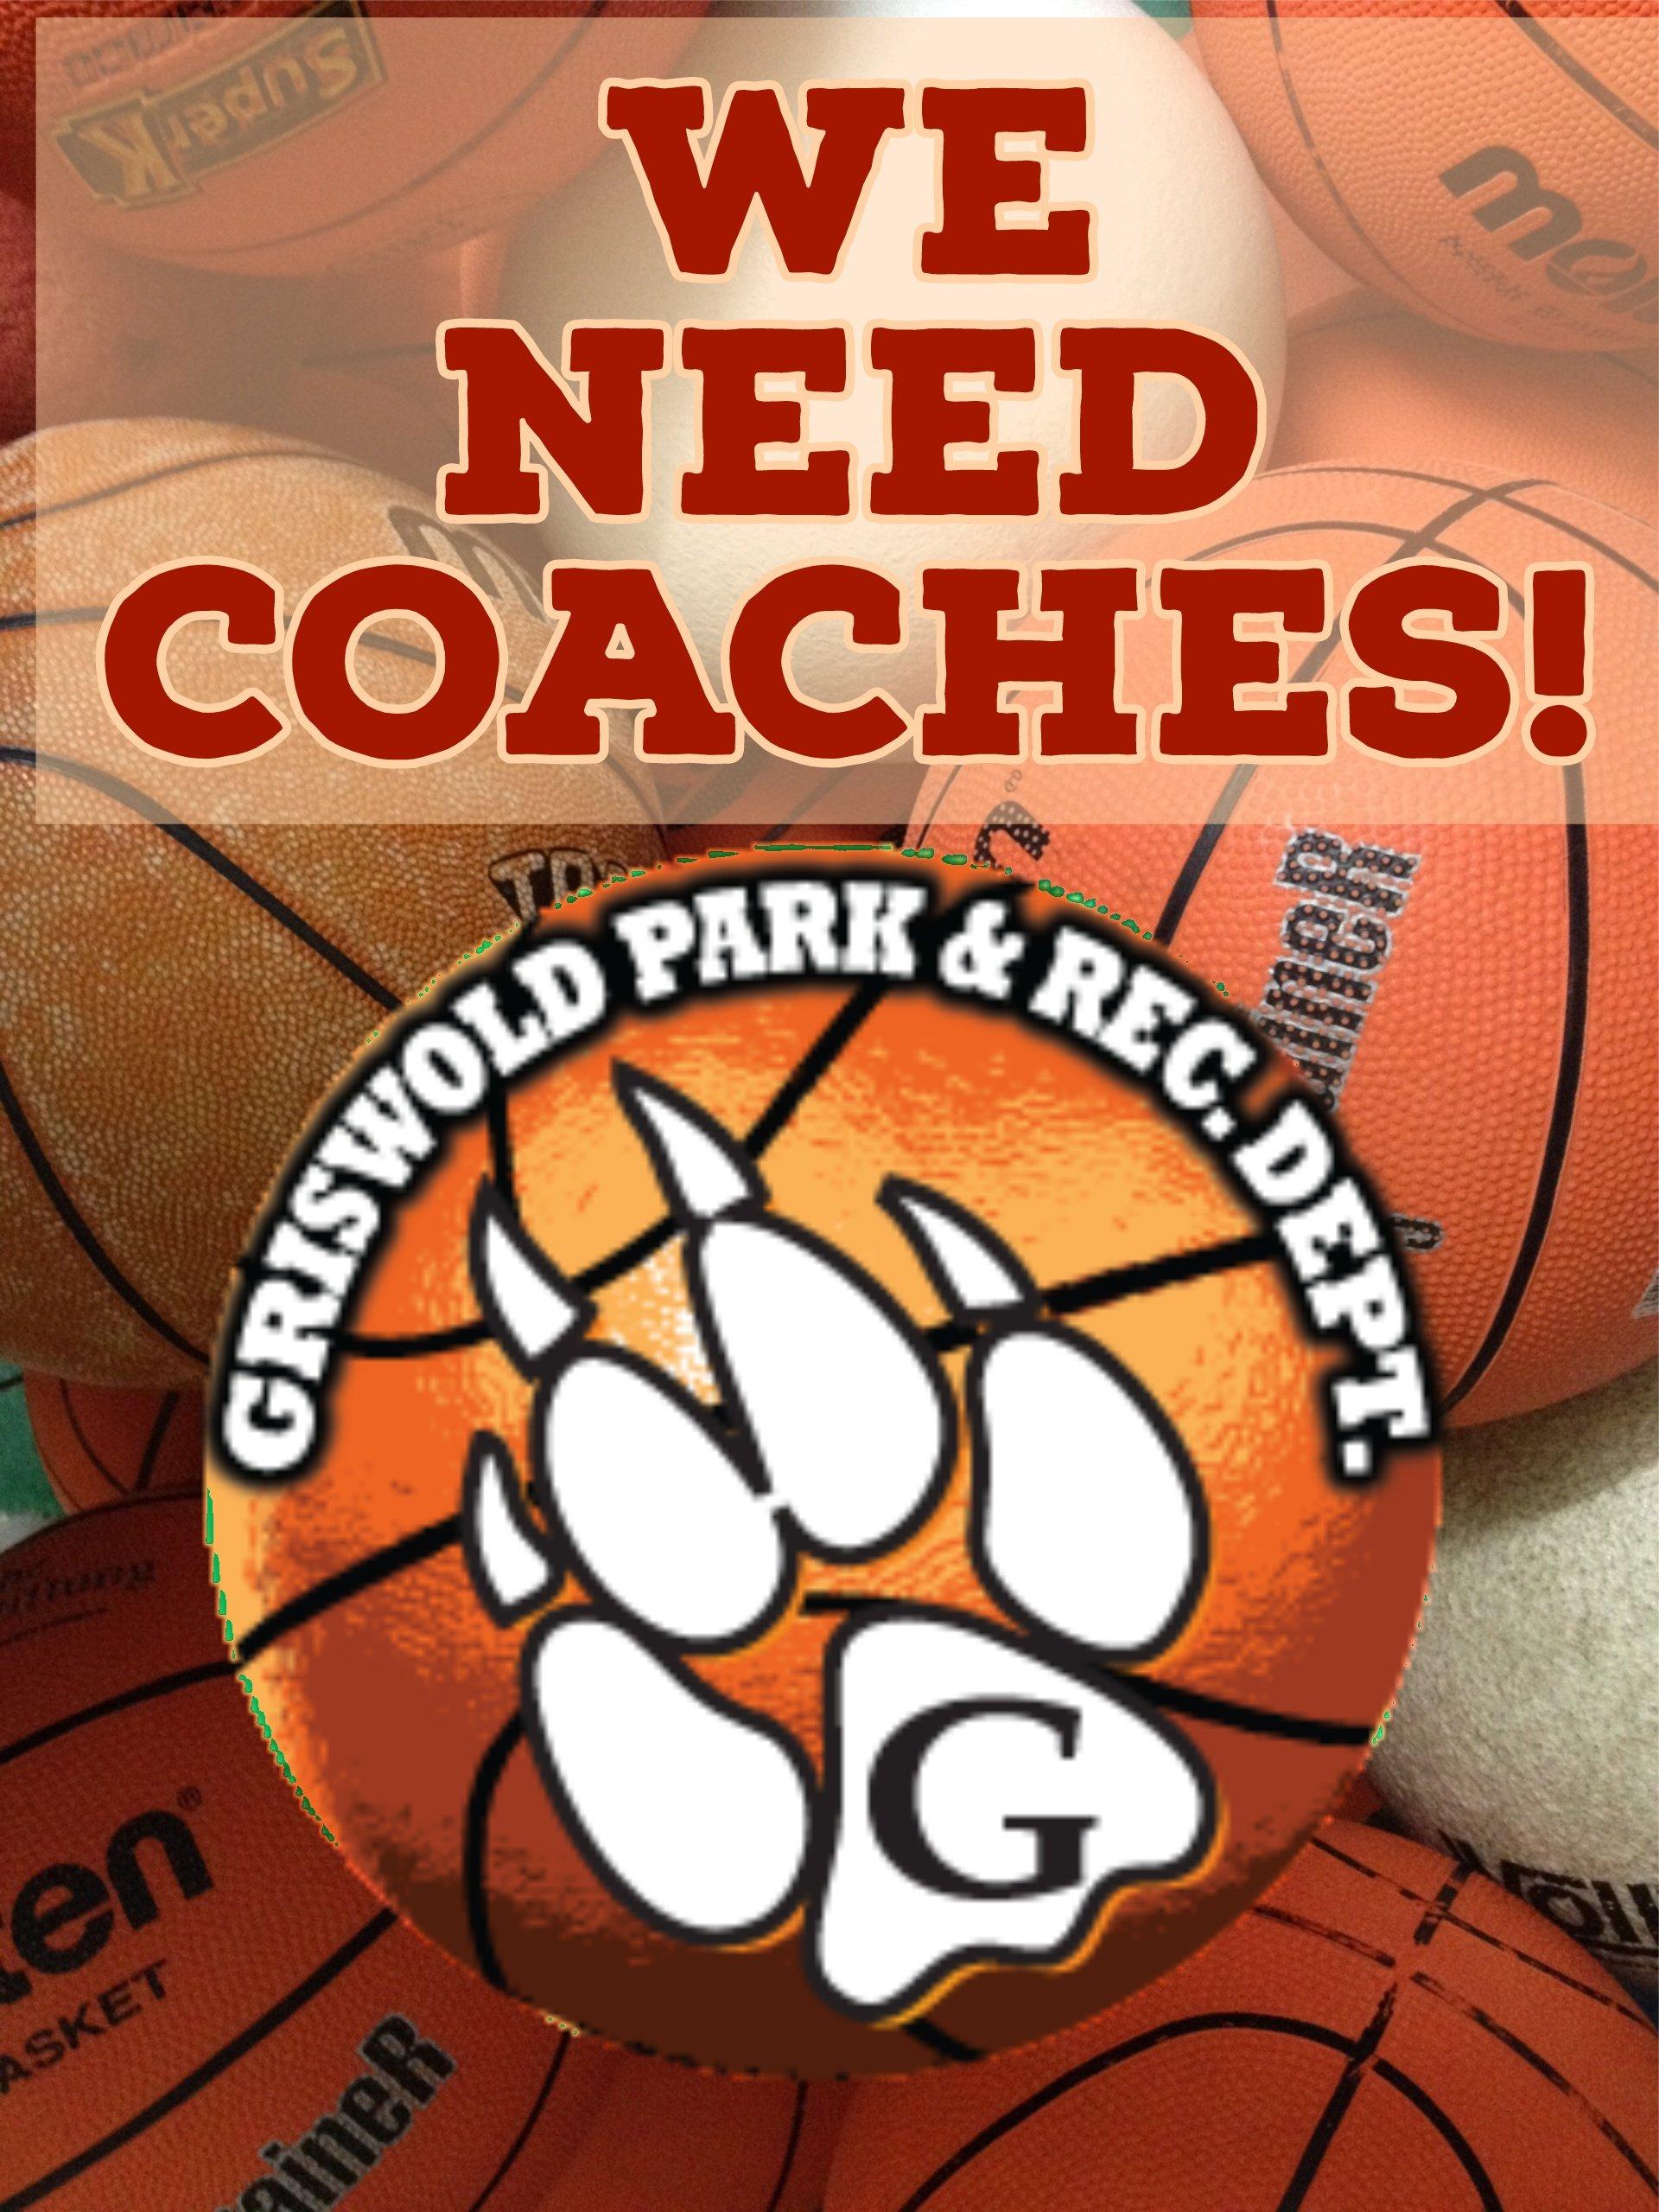 https://0201.nccdn.net/1_2/000/000/121/8bf/We-Need-Coaches-promo-1920x2560.jpg